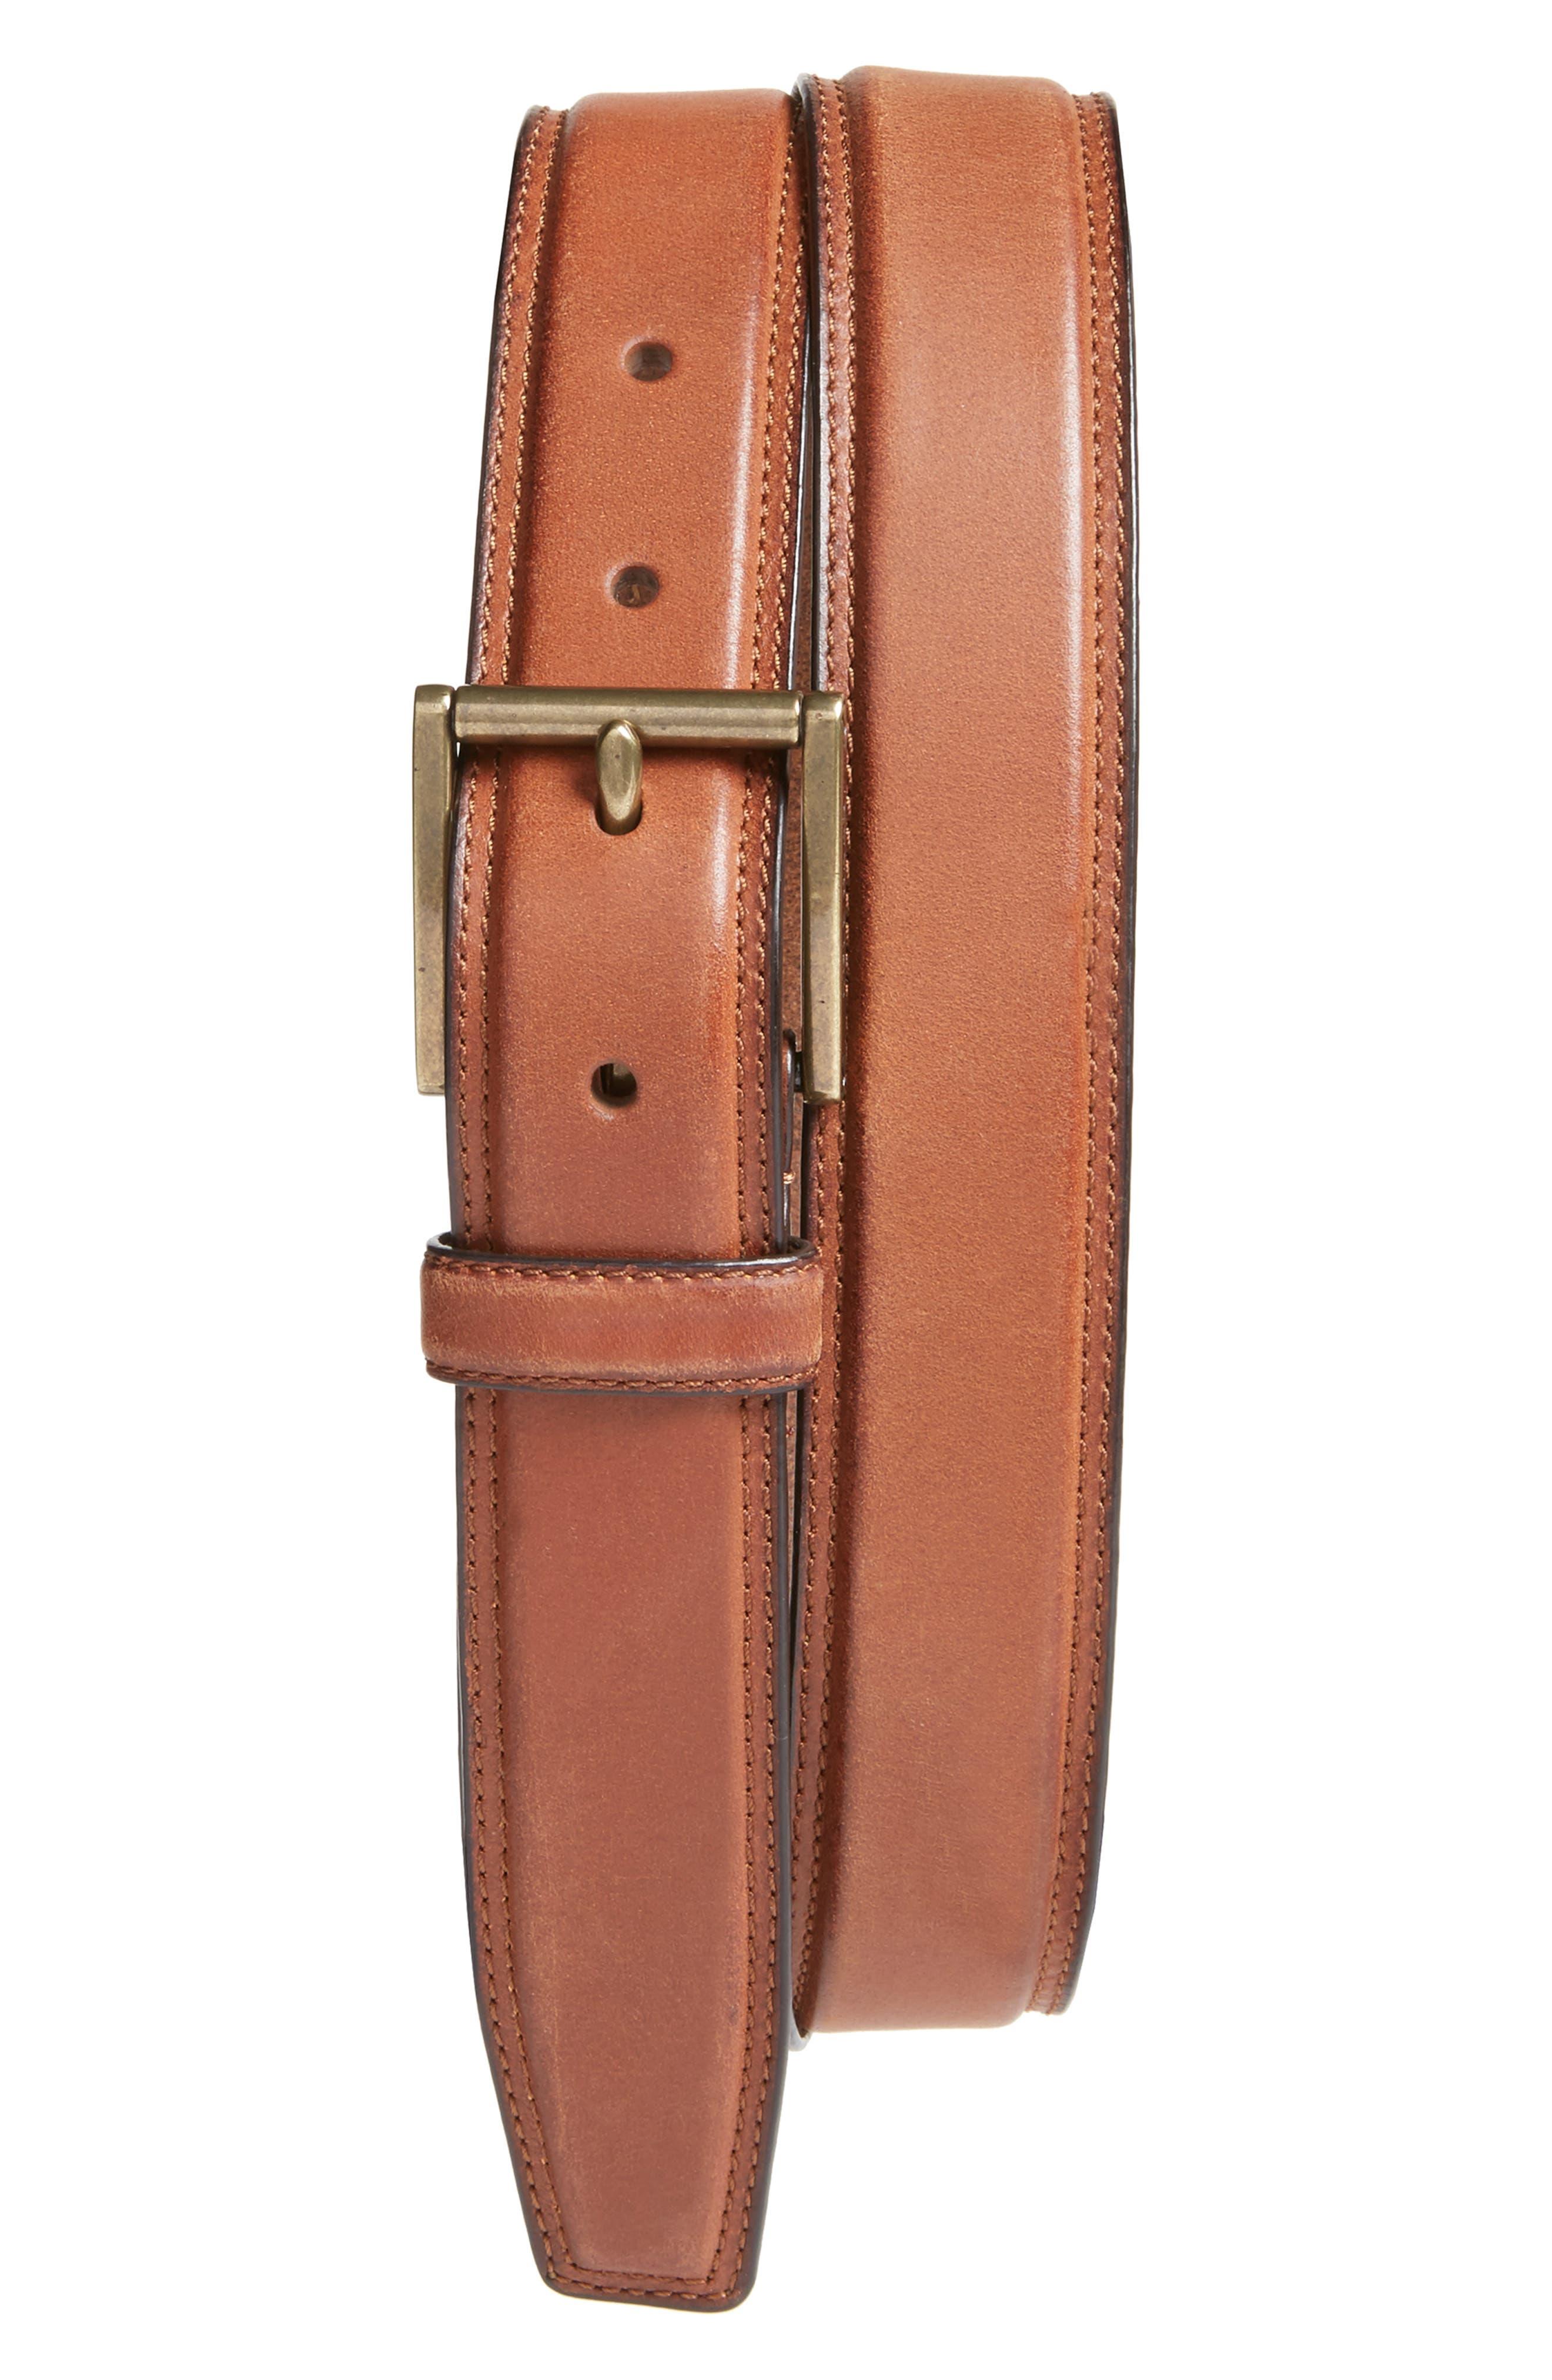 COLE HAAN Leather Belt, Main, color, 201